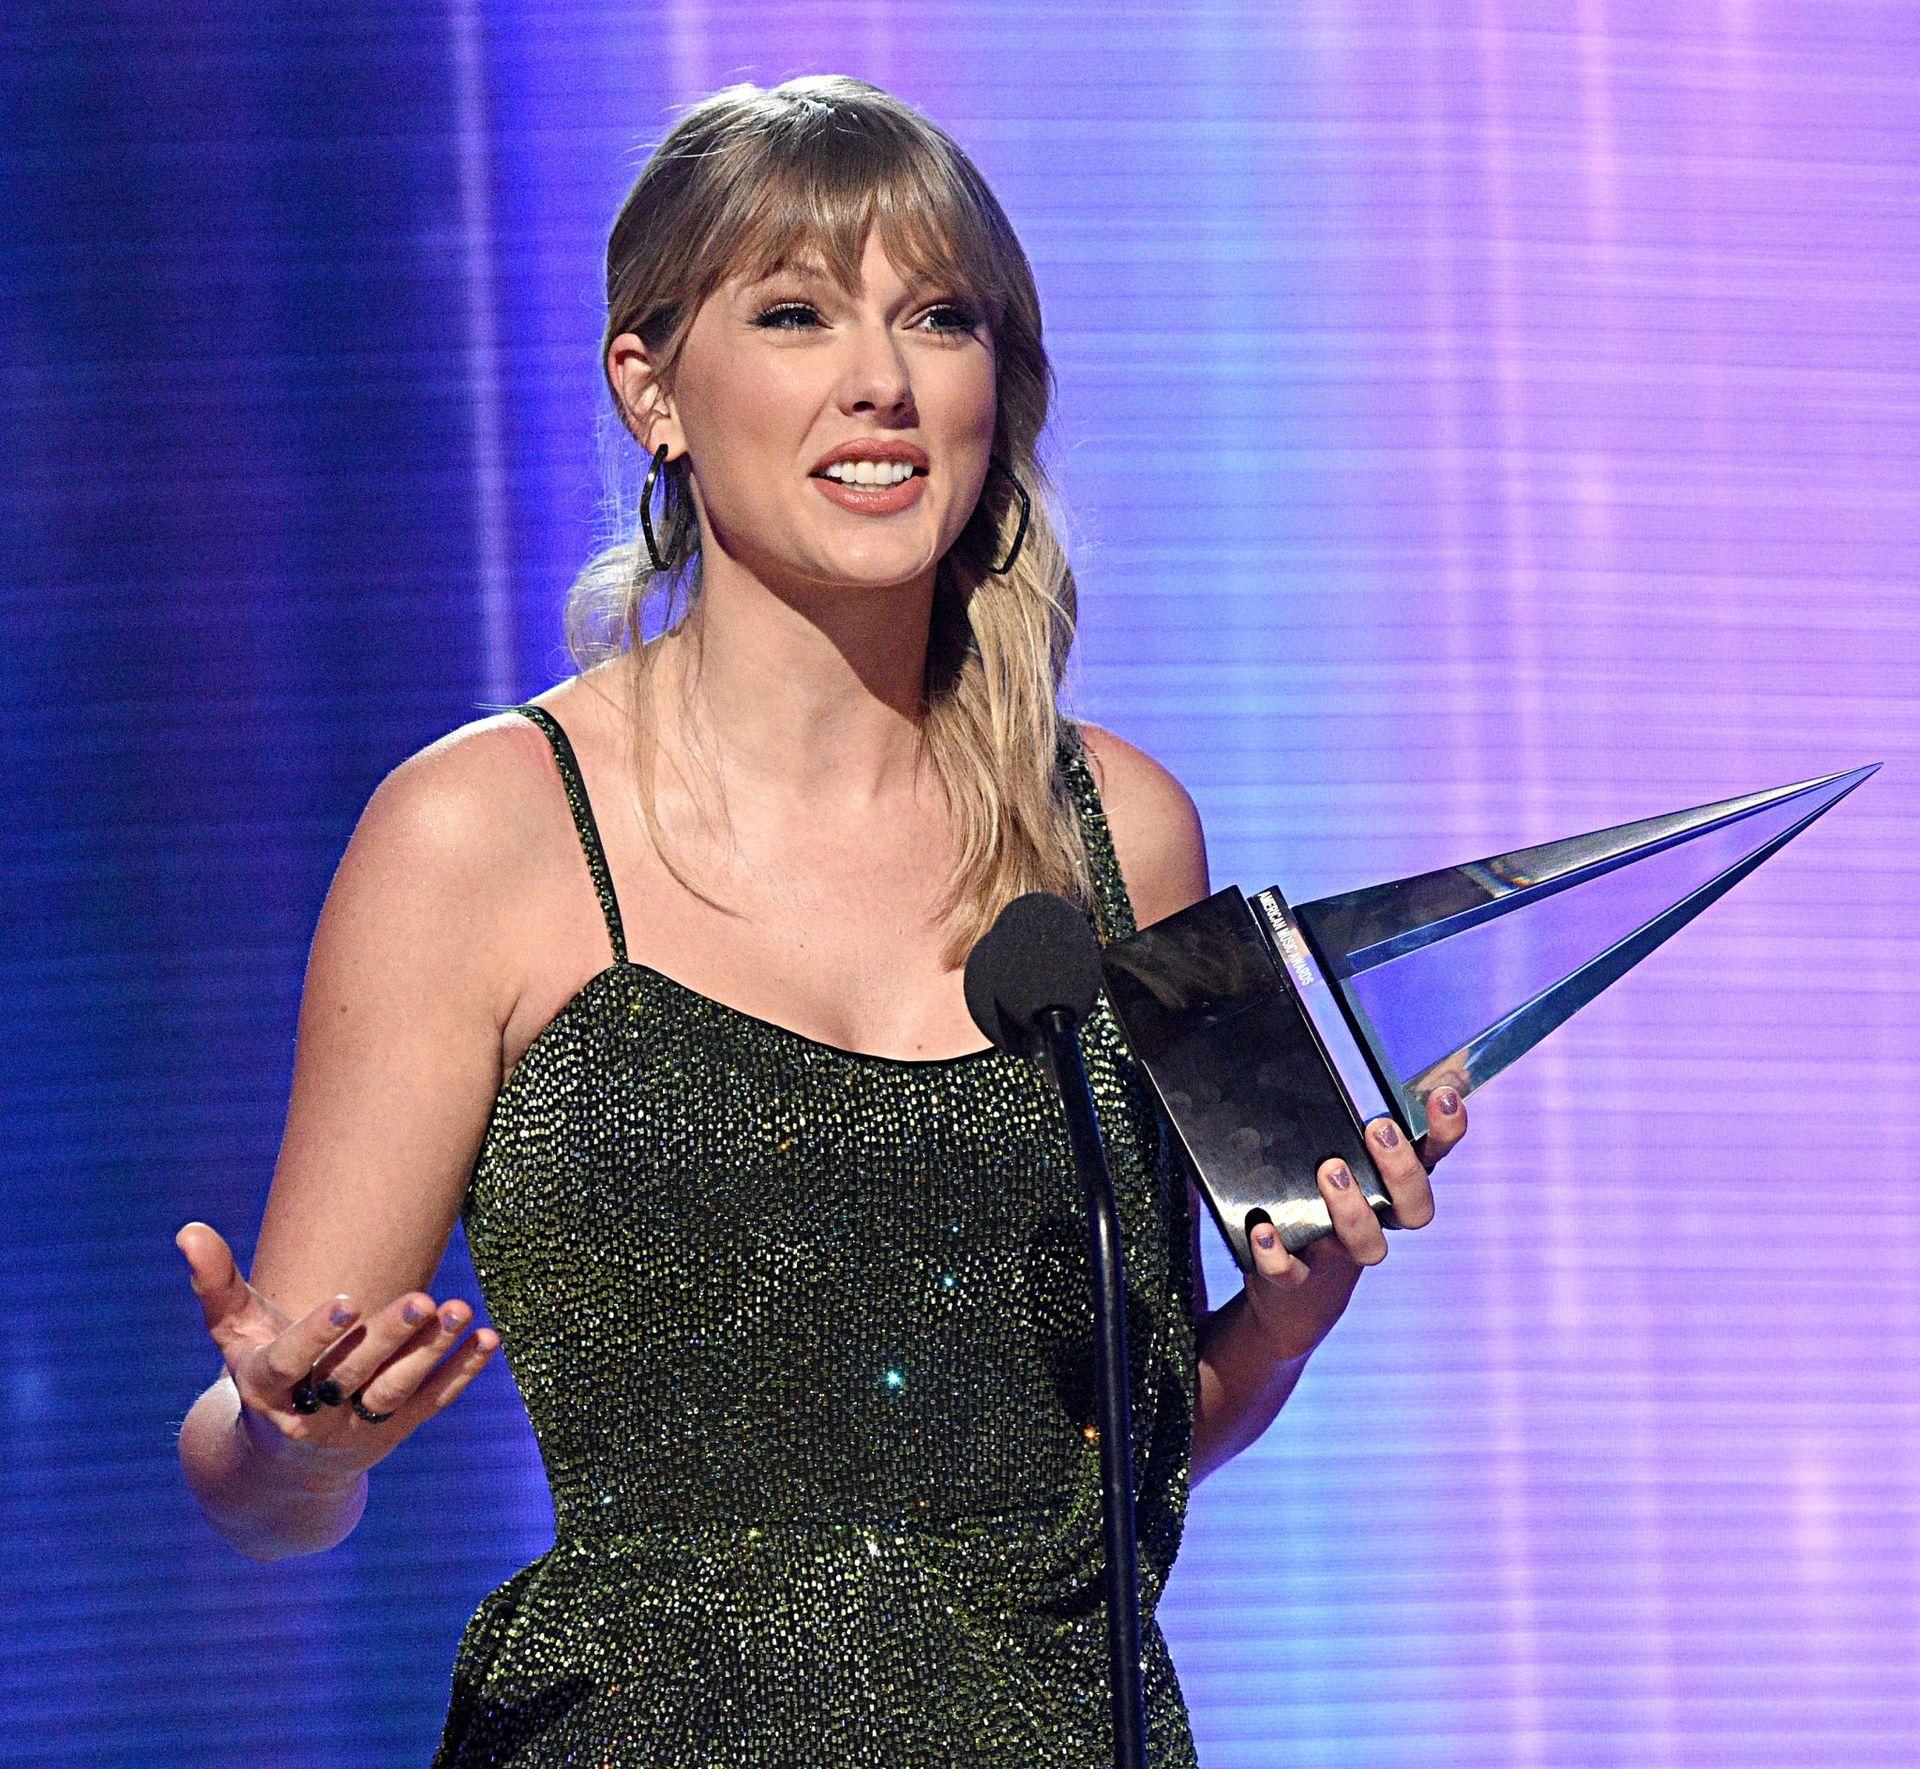 Taylor Swift Sexy 0054